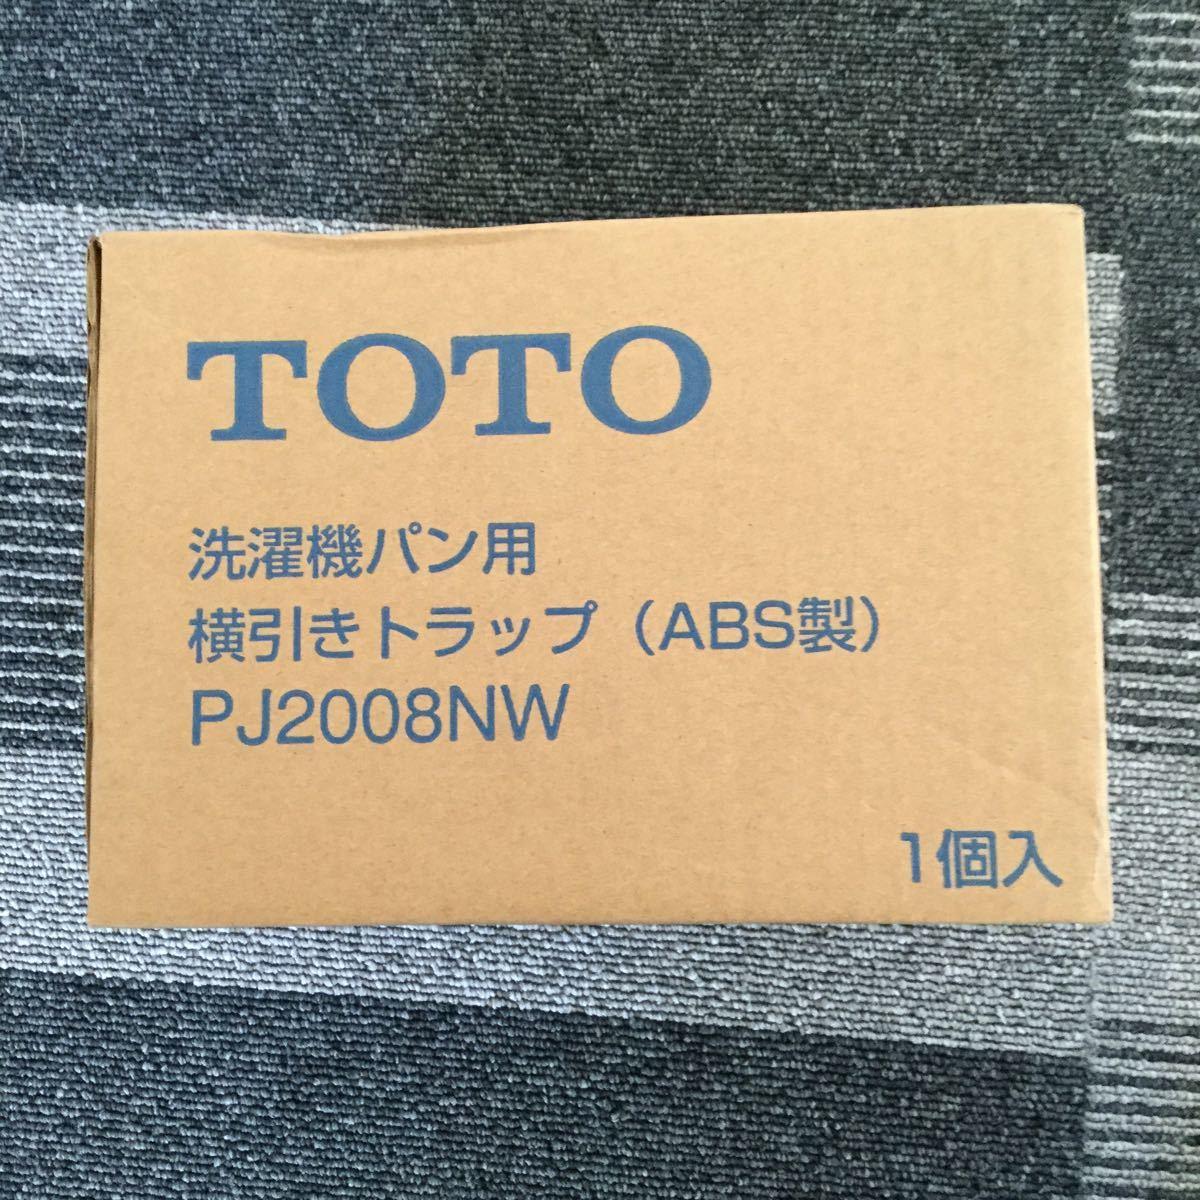 TOTO PJ2008NW 洗濯機パン用 横引きトラップ (ABS製)_画像1